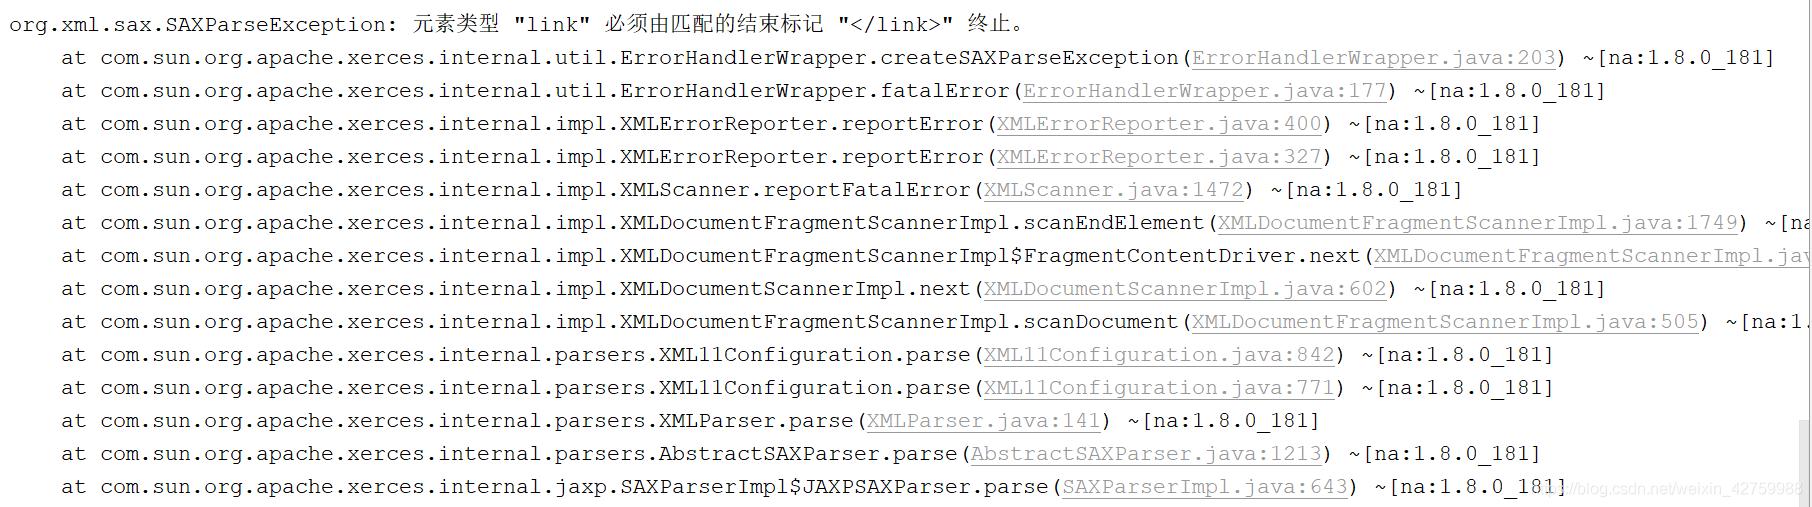 SpringBoot切换版本时项目访问不到thymeleaf页面404